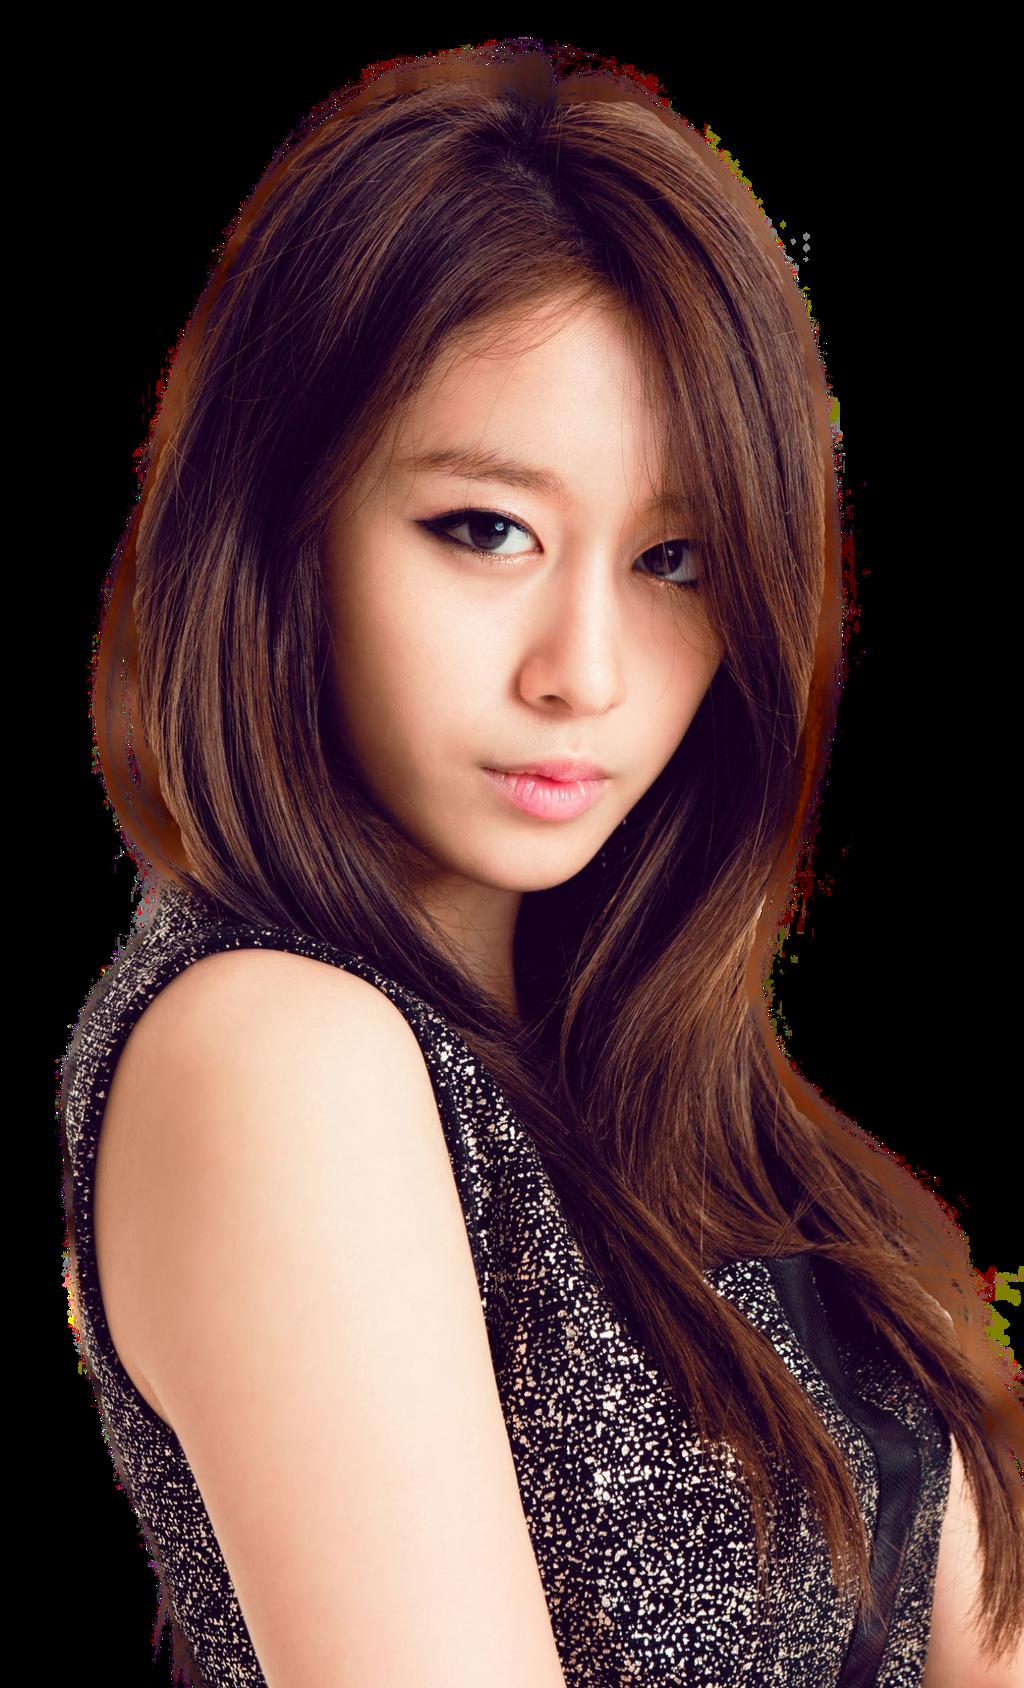 jiyeon__t_ara__png__render__by_sellscarol-d5ua9i6.png